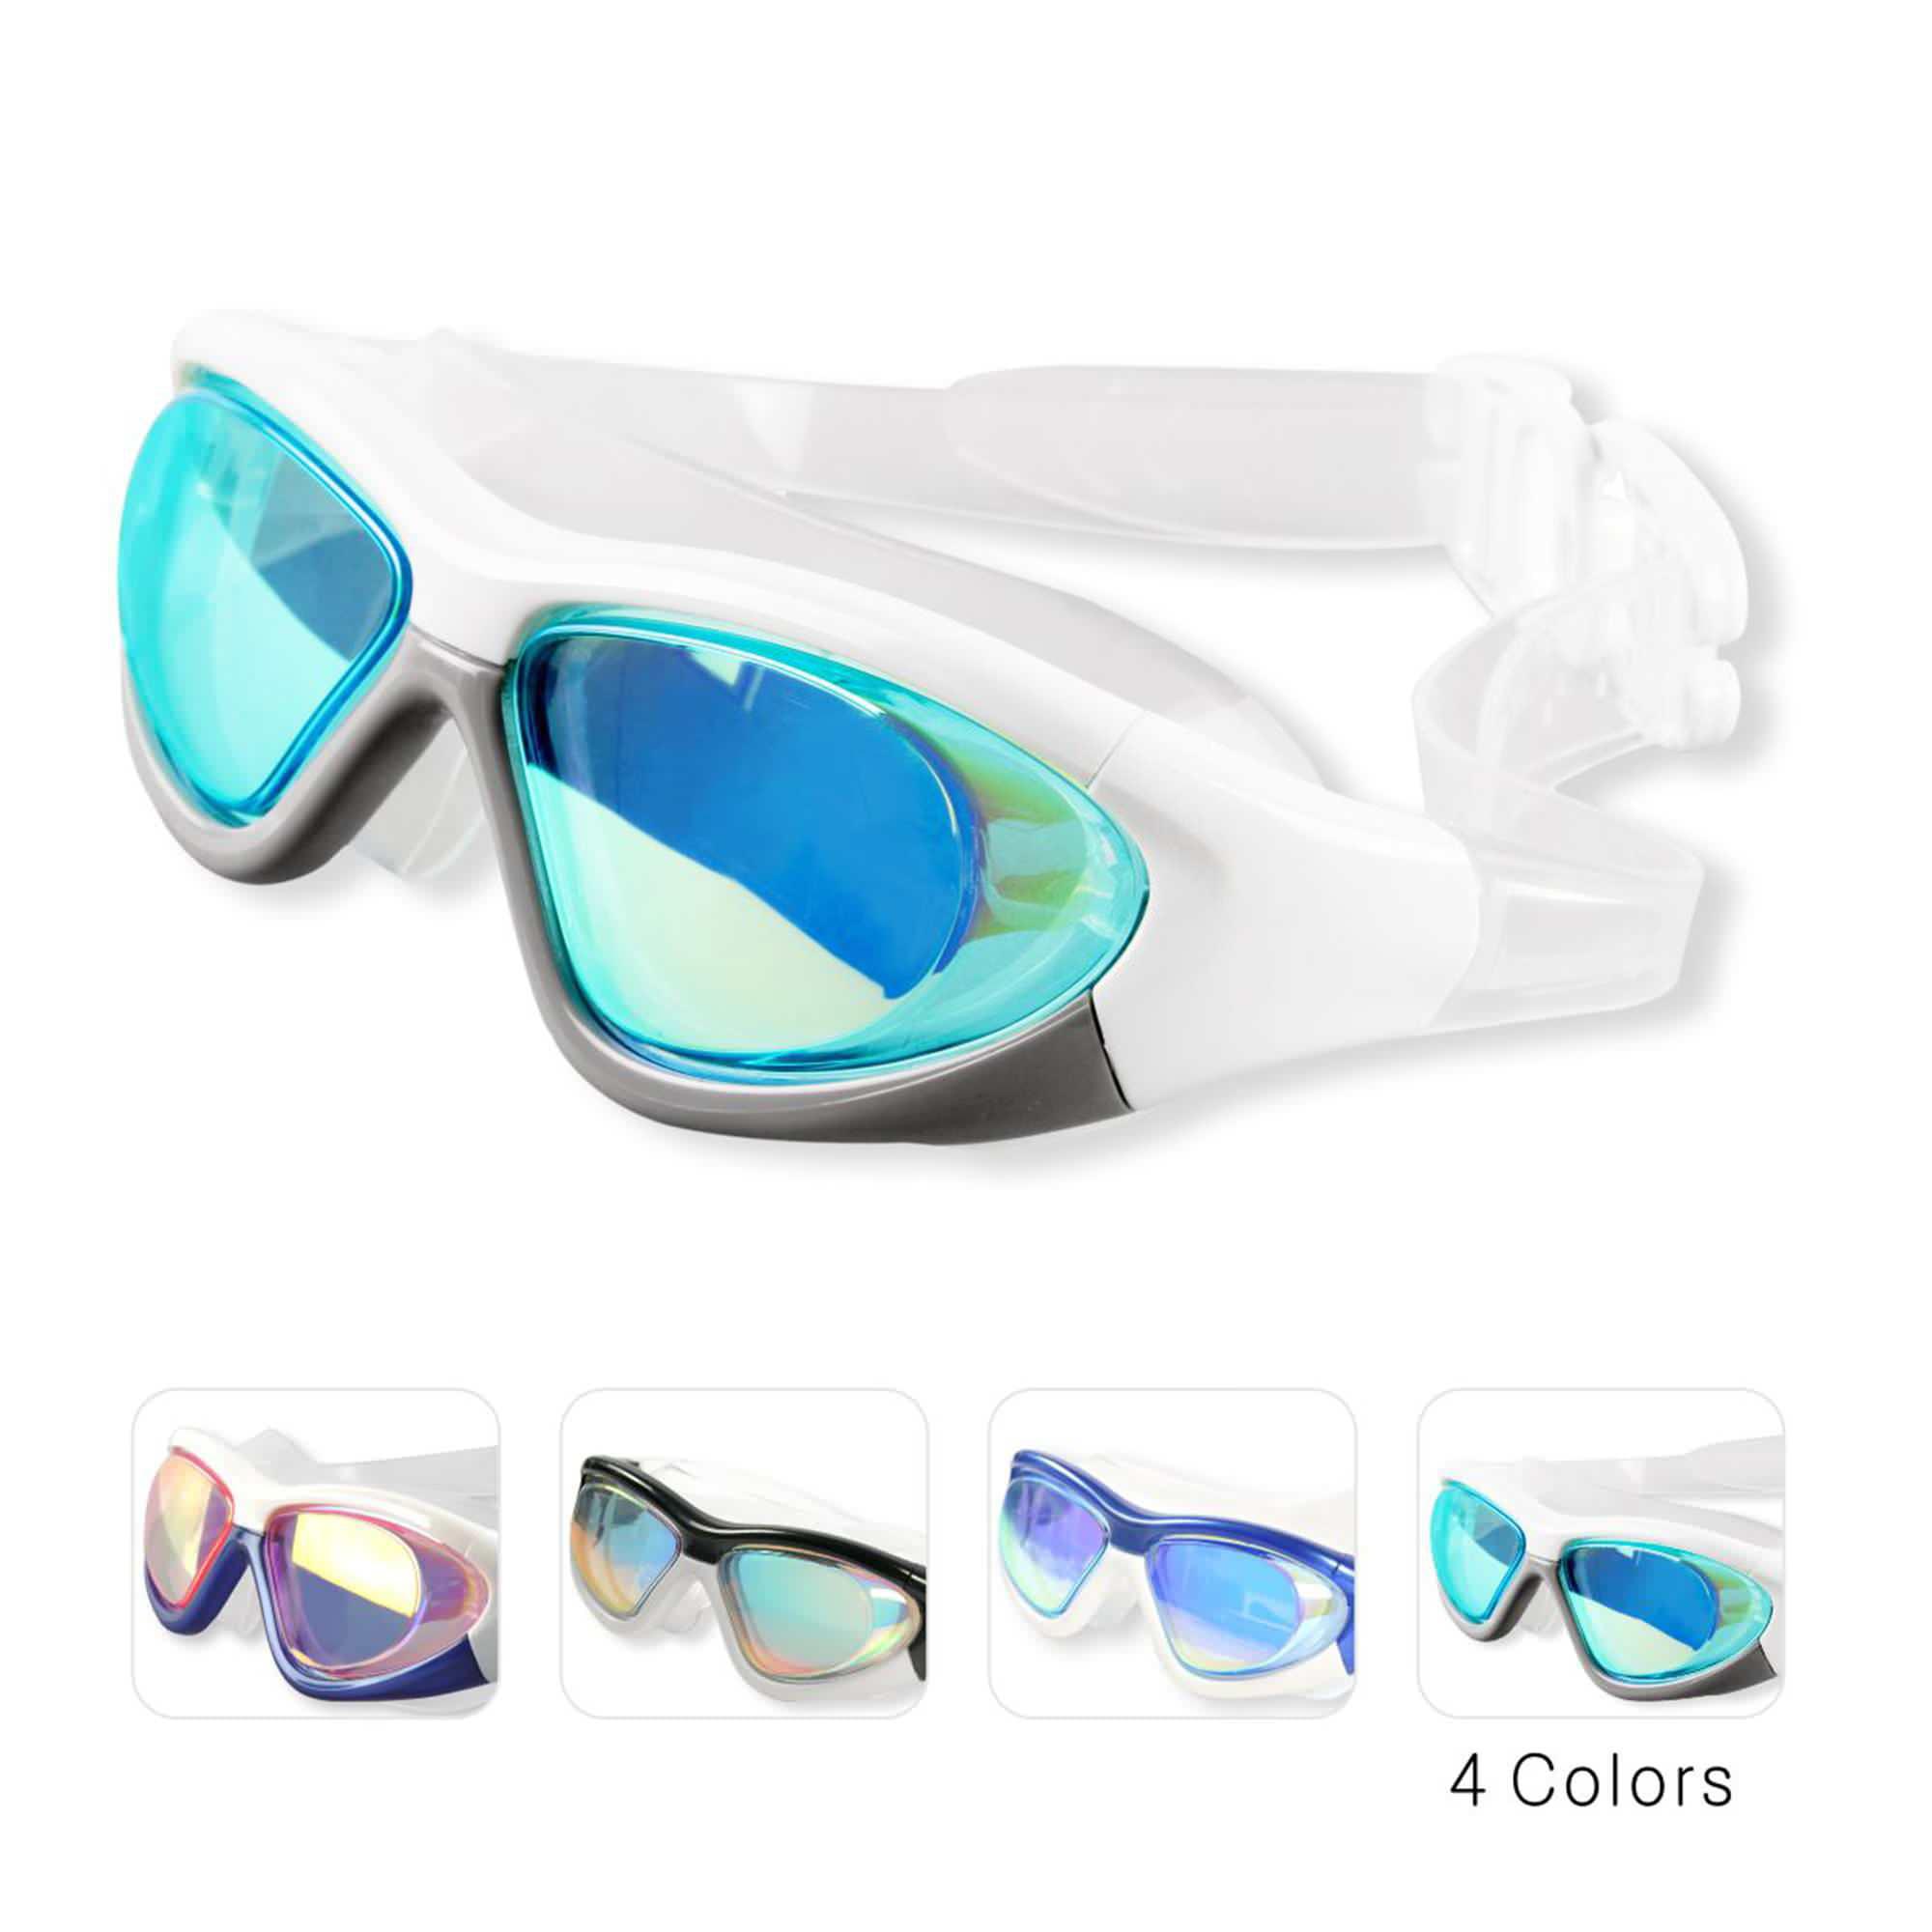 Black Nose Clip+Ear Plug+Anti fog UV Swimming Swim Adjustable Glasses B ER